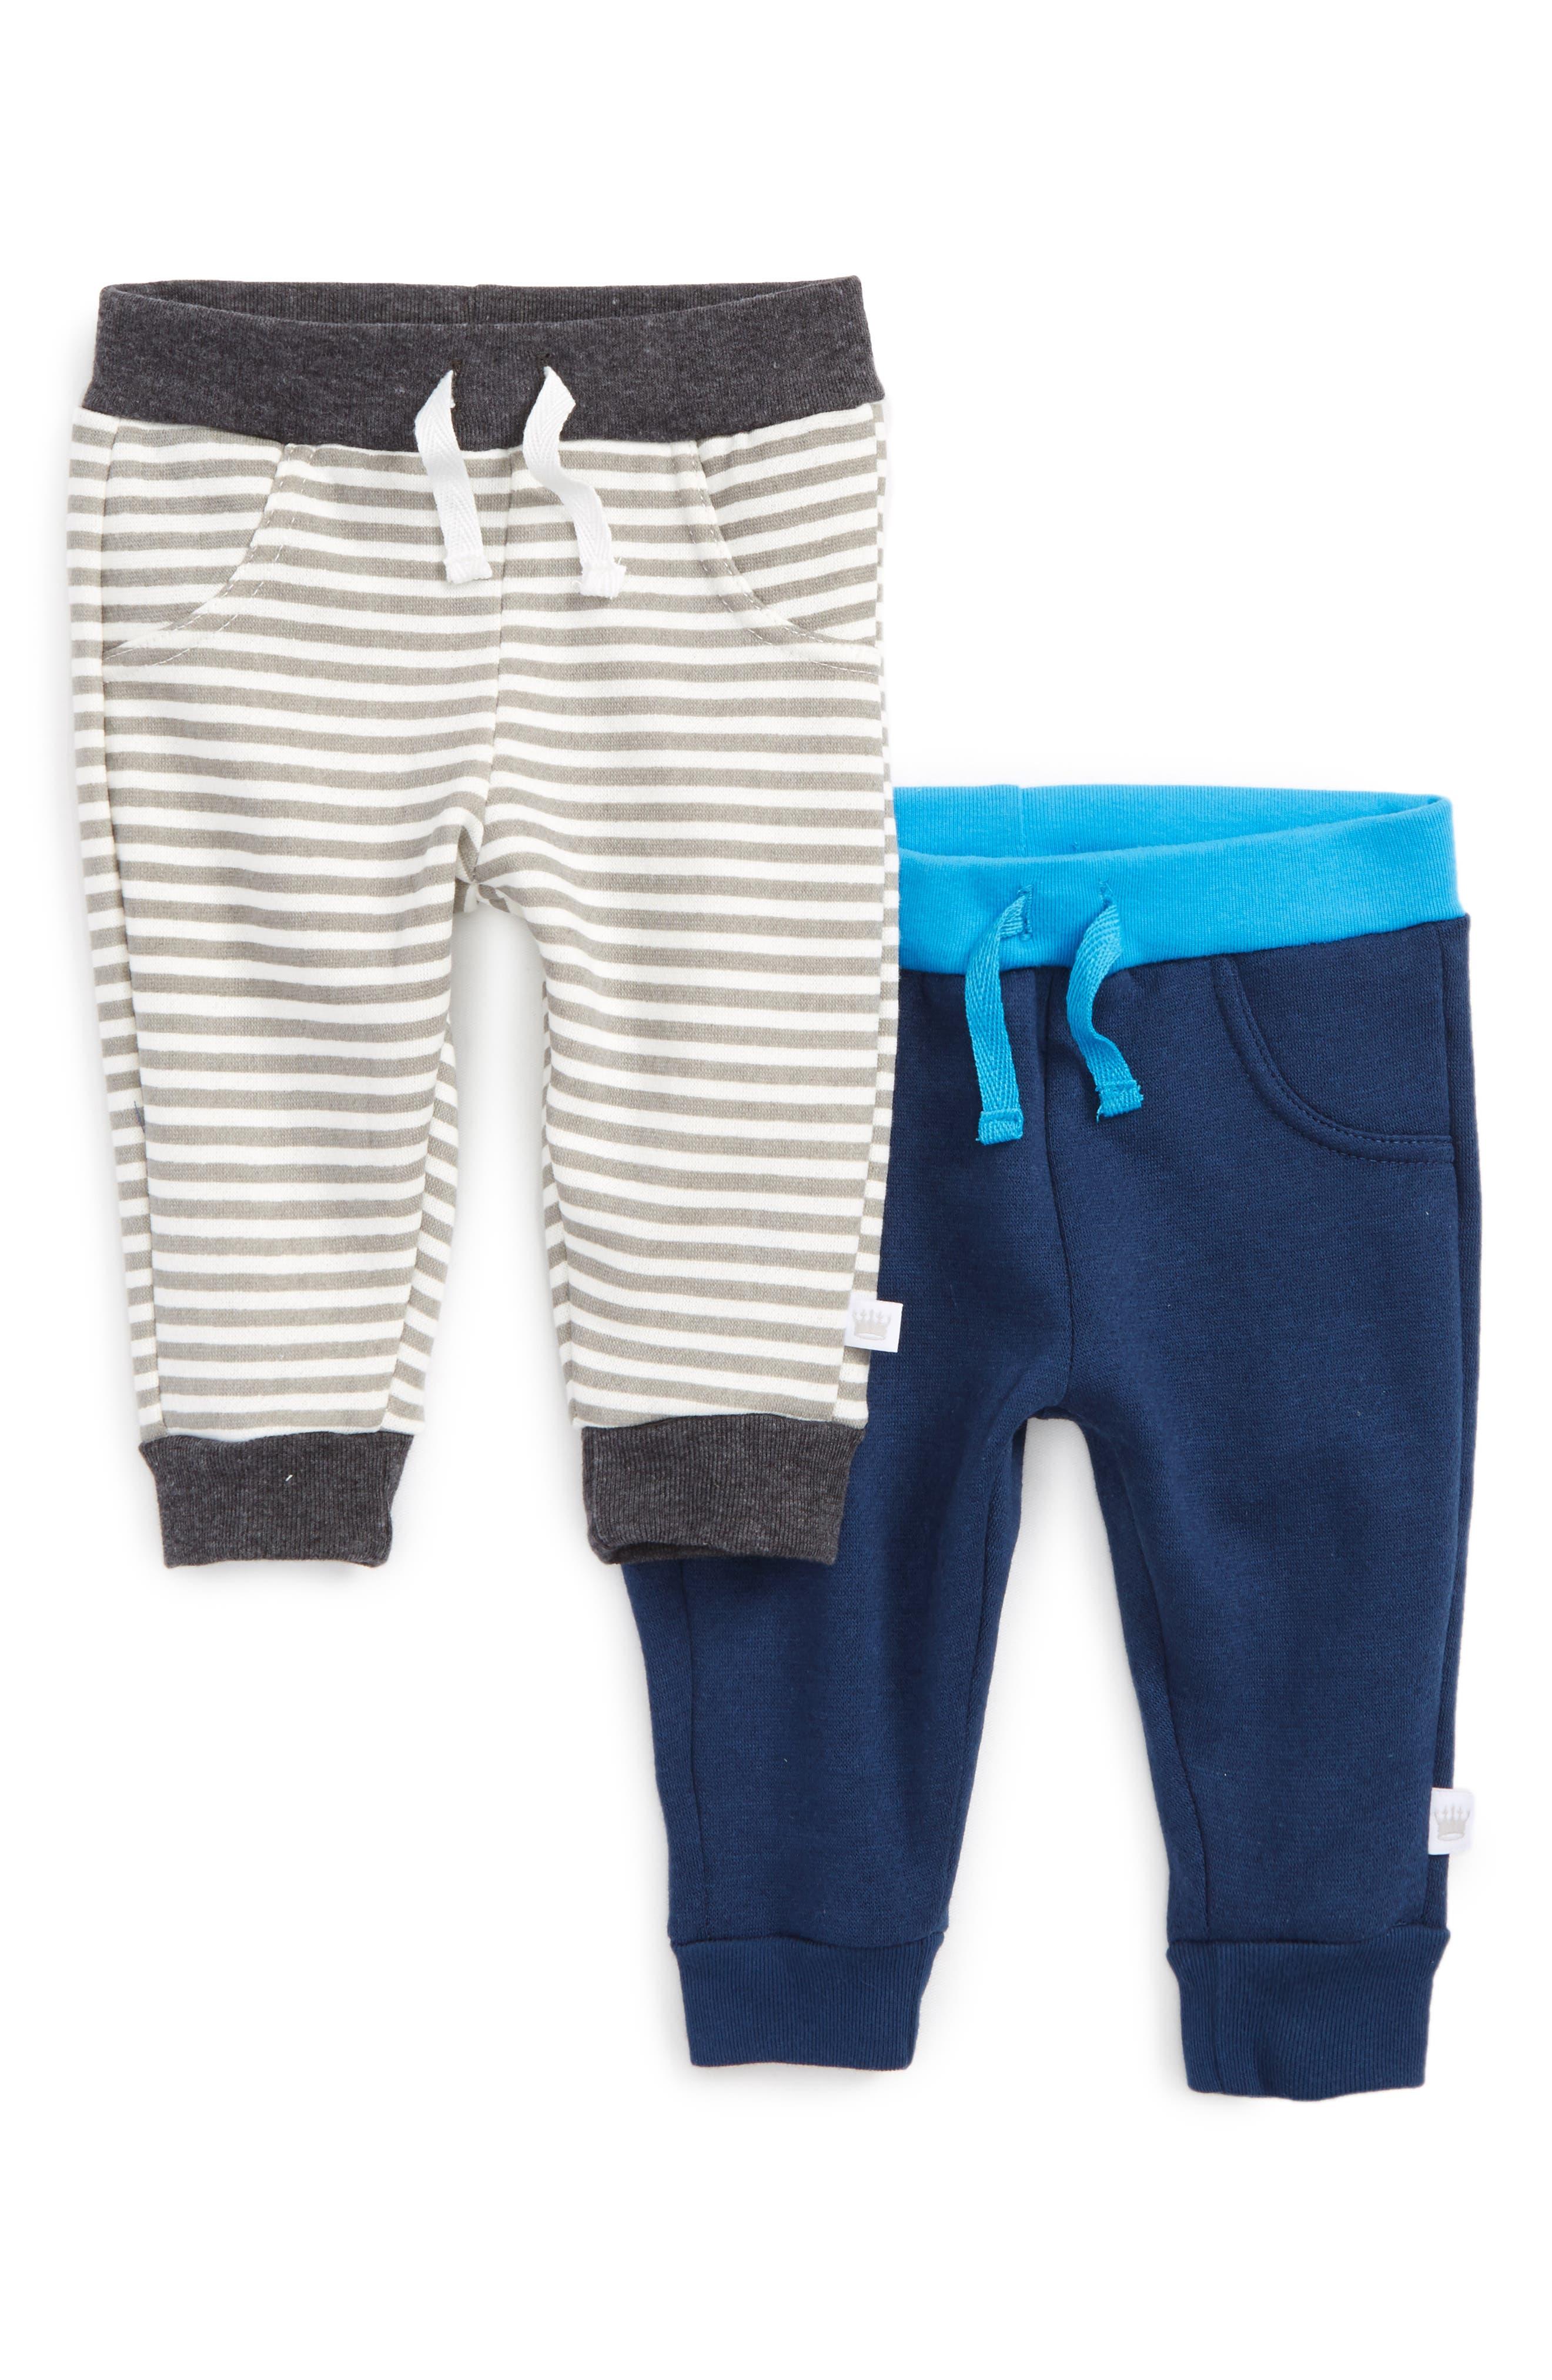 2-Pack Sweatpants,                         Main,                         color, 461